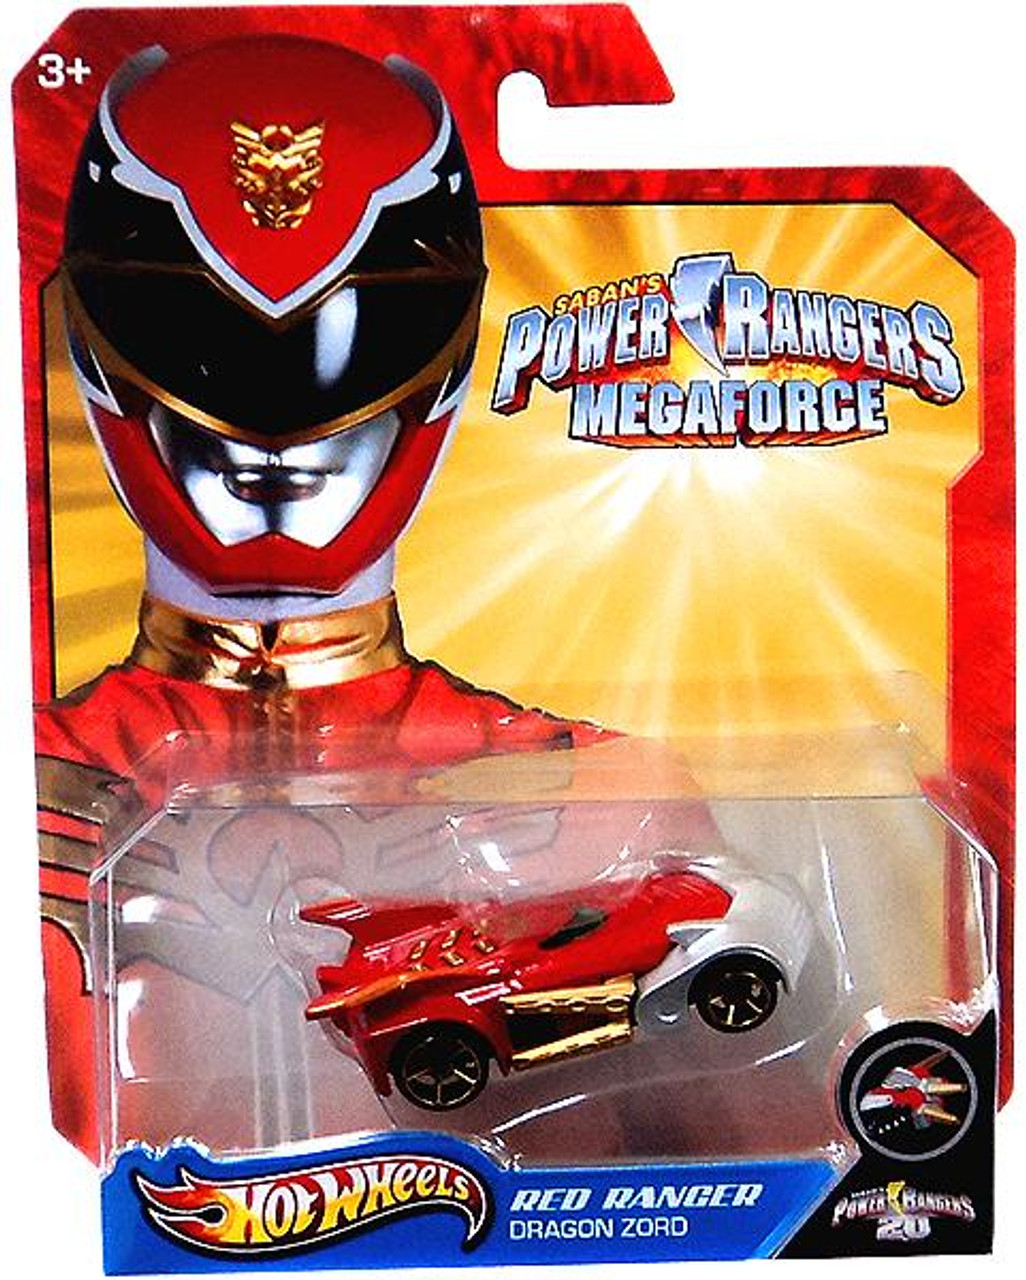 Power Rangers Megaforce Hot Wheels Red Ranger Dragon Zord Diecast Car